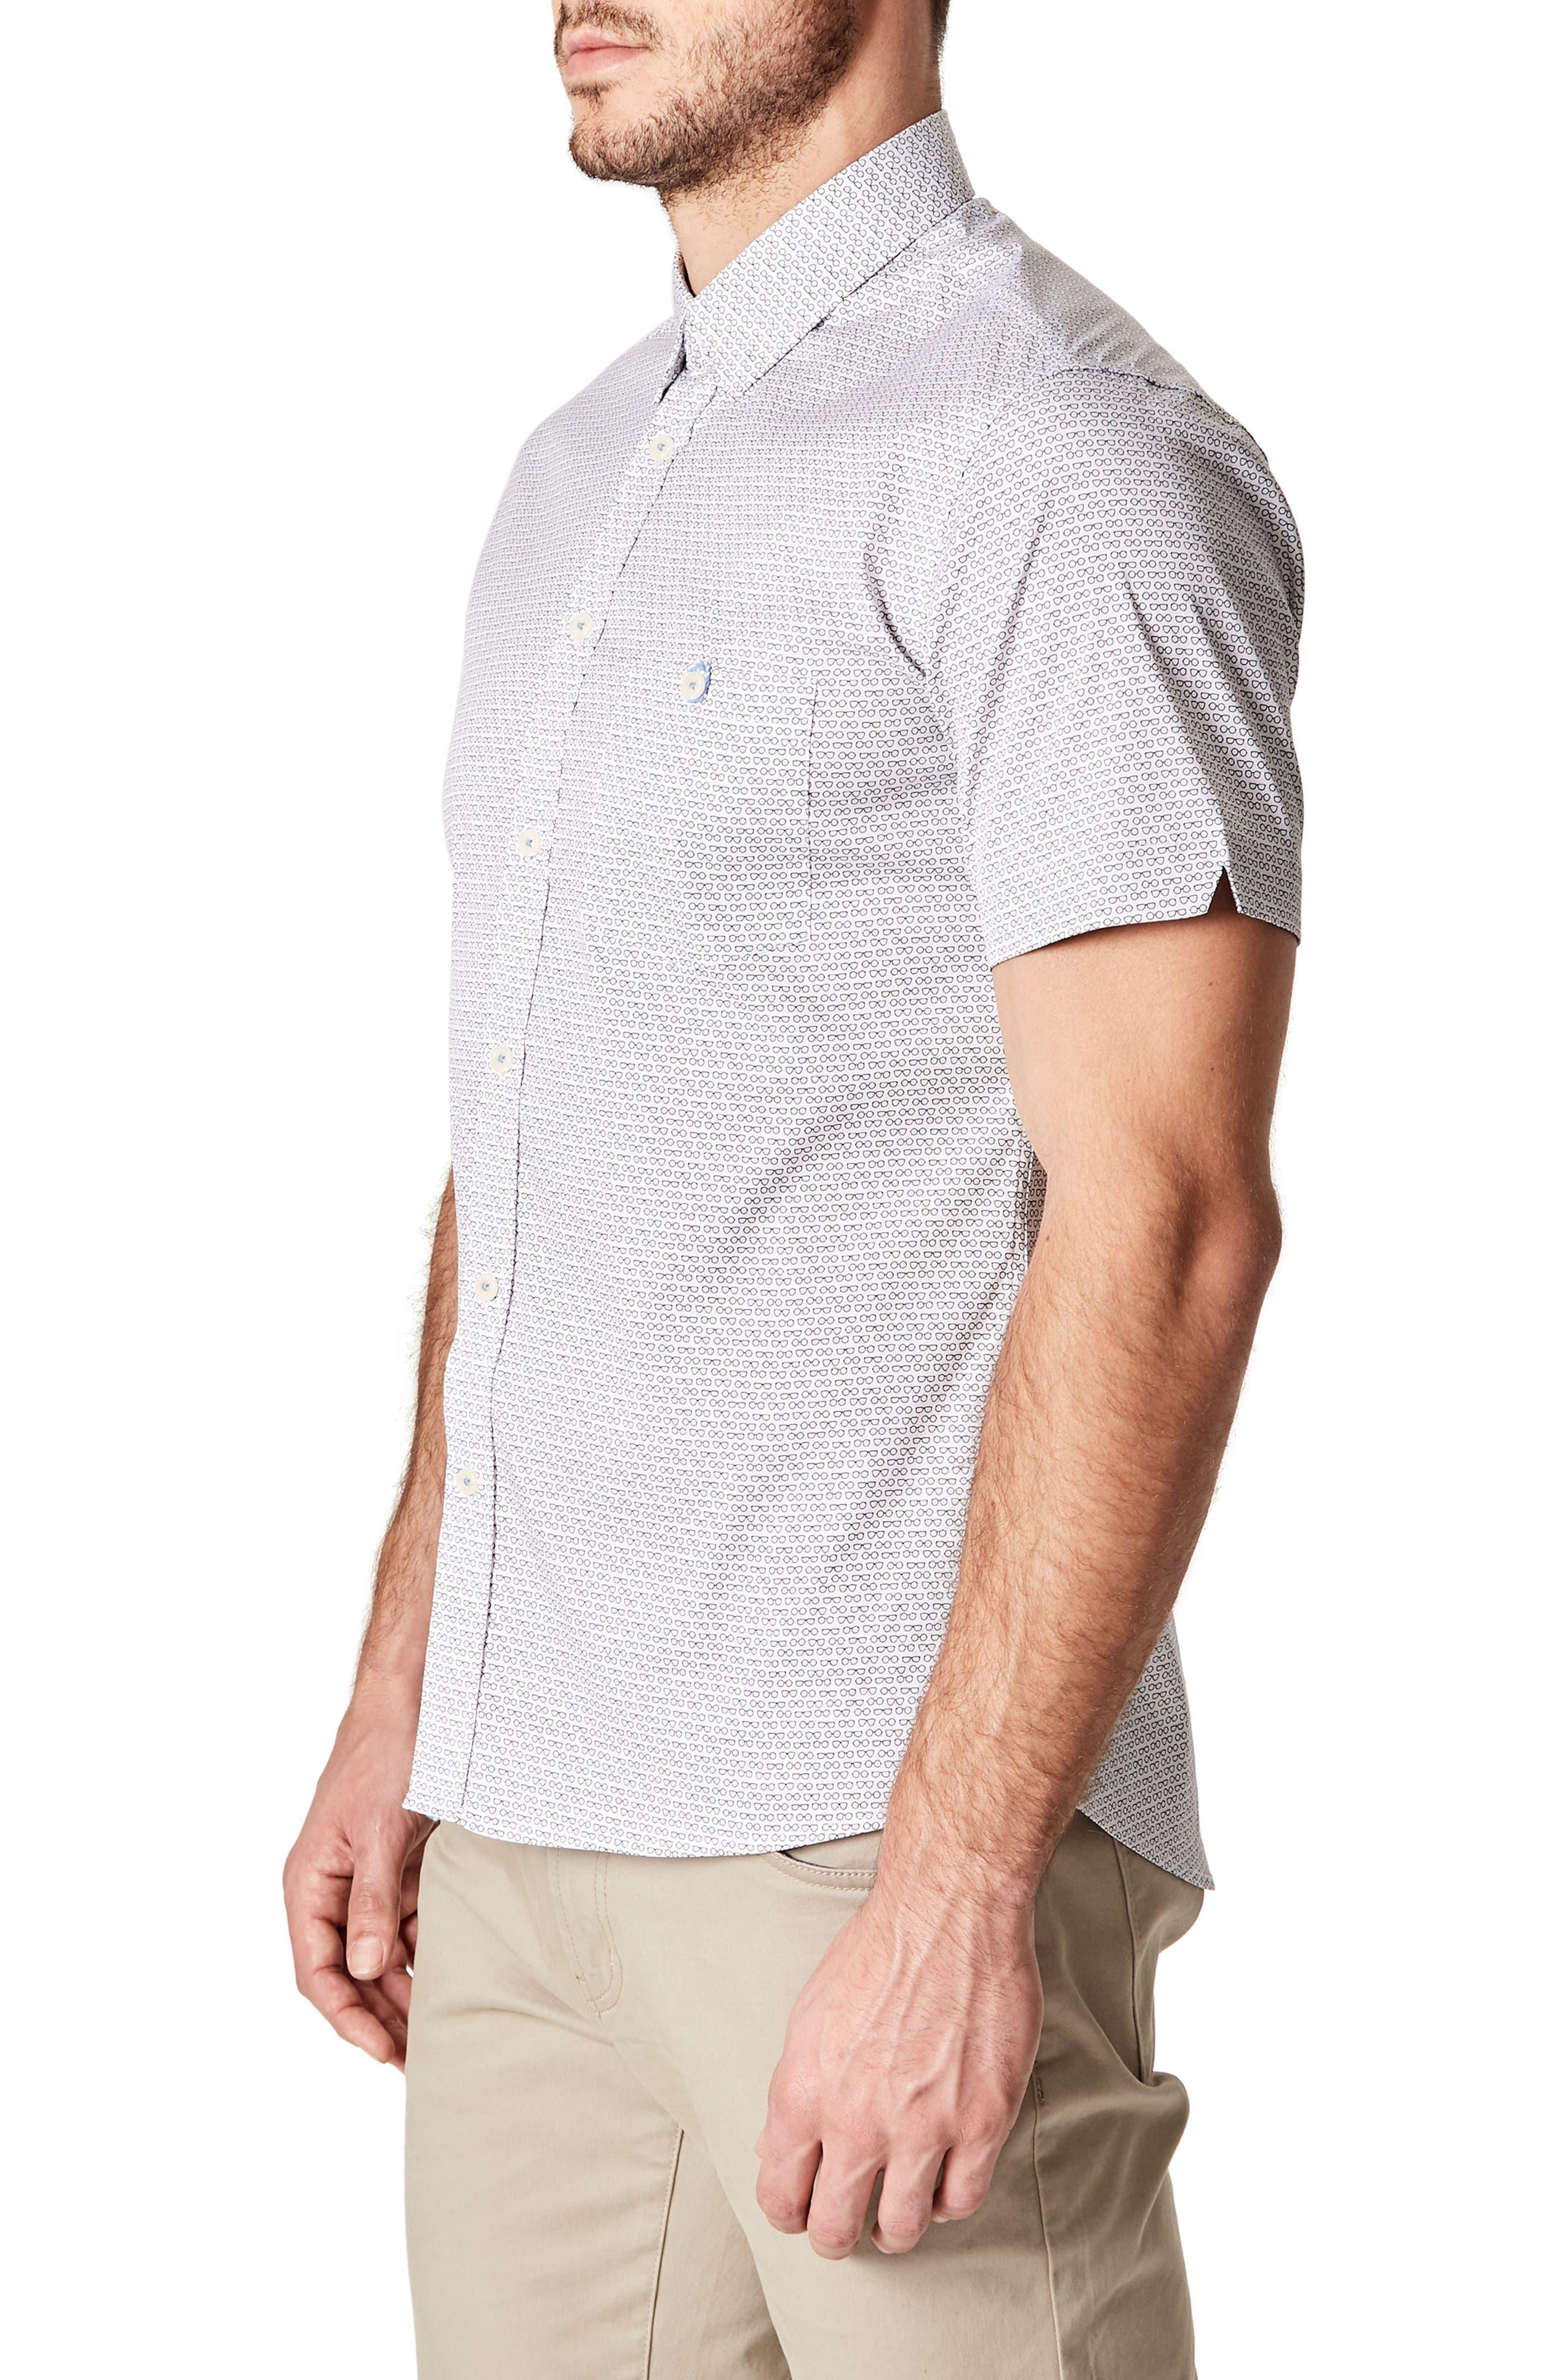 Bright Life Woven Shirt,                             Alternate thumbnail 3, color,                             White